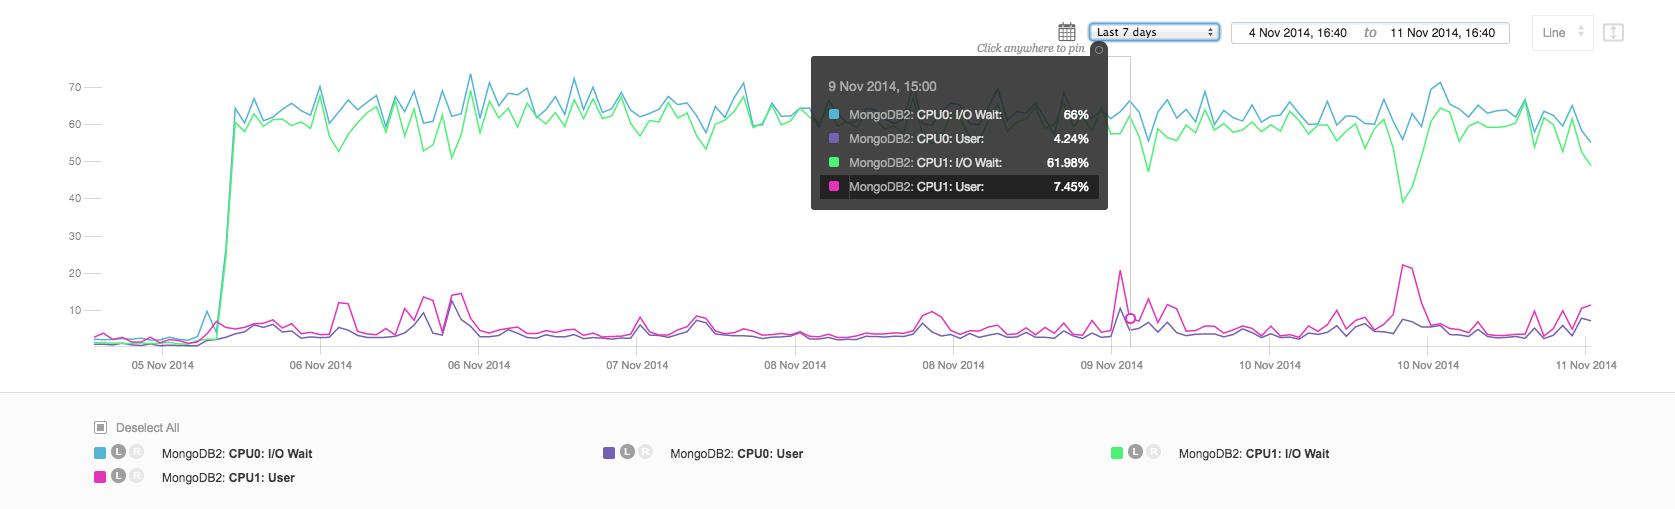 Server Density Dashboard - Primary MongoDB